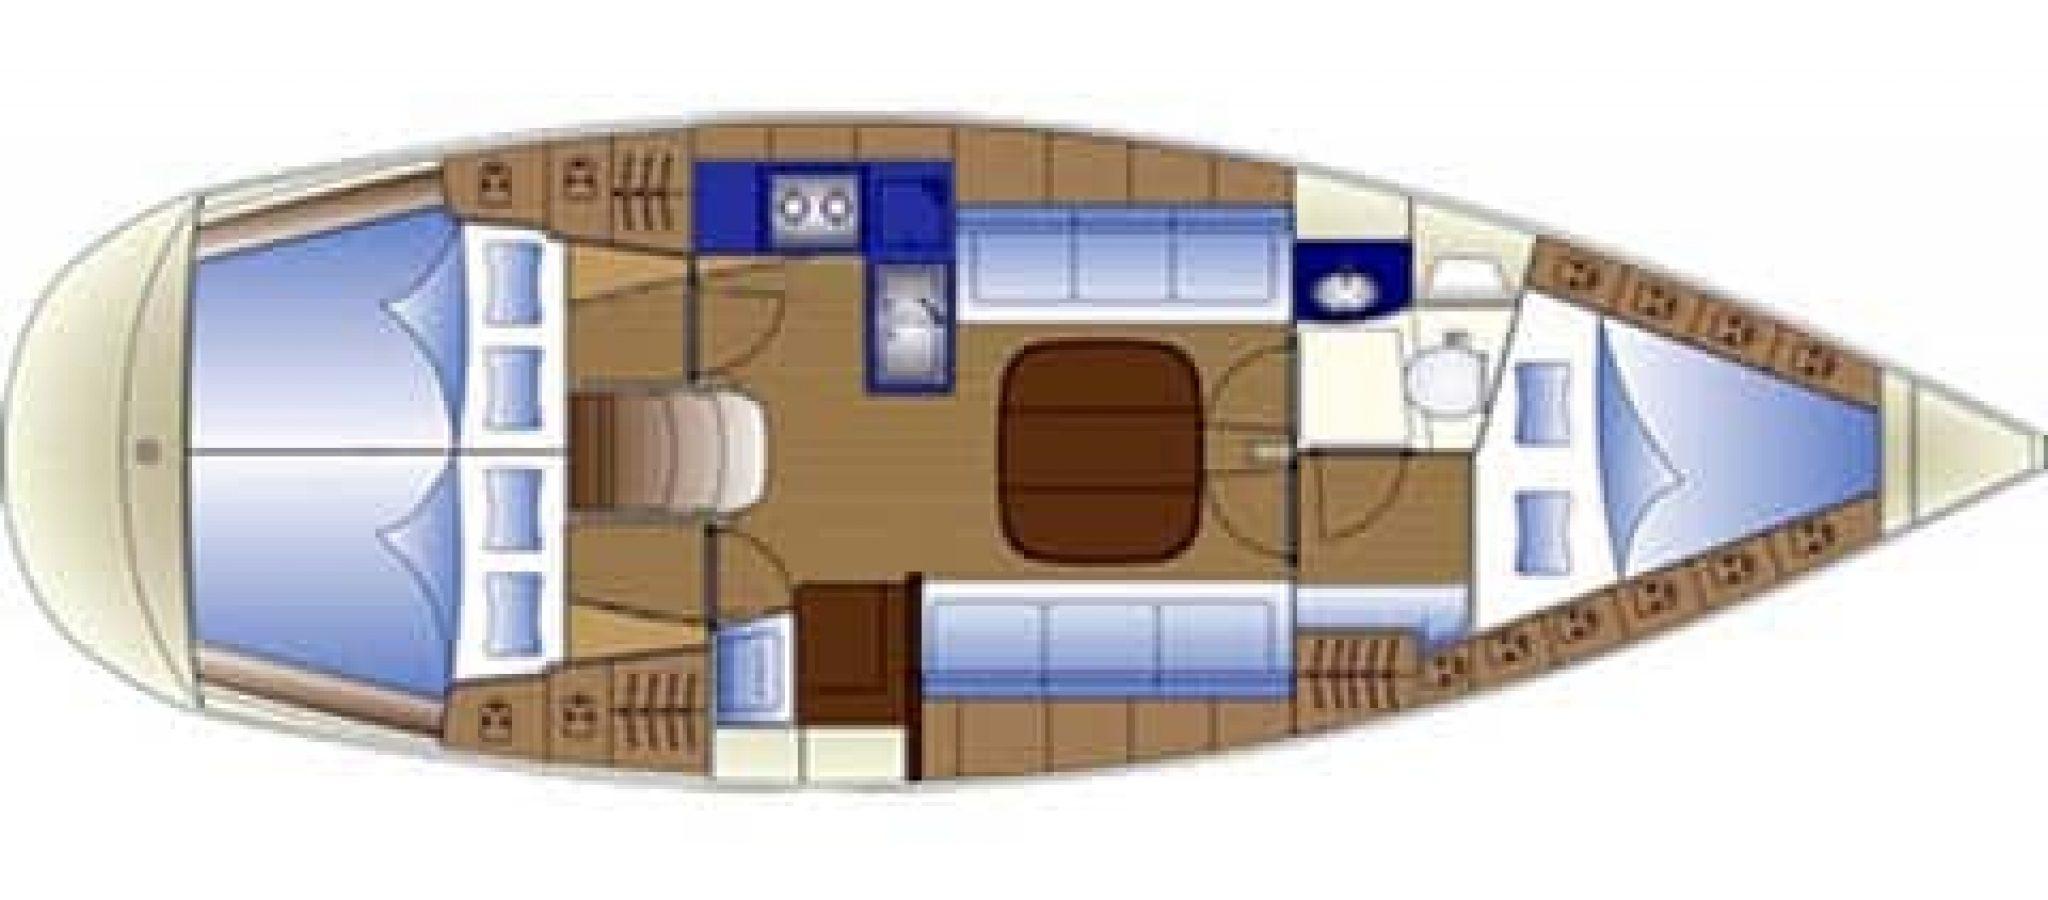 Bavaria 36 plan 3 cabines